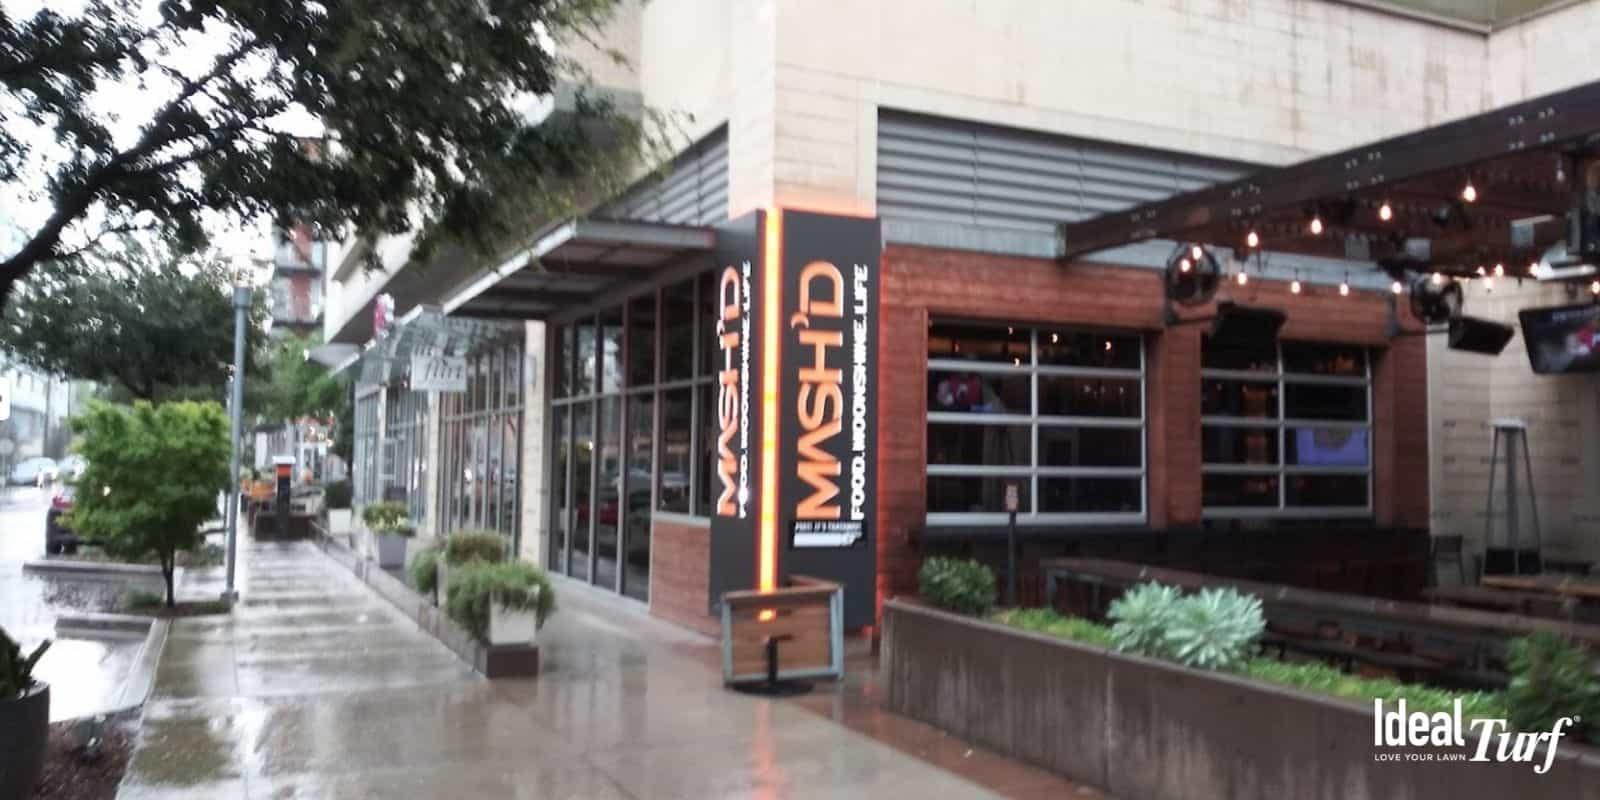 Front entrance of Mash'd in Fort Worth